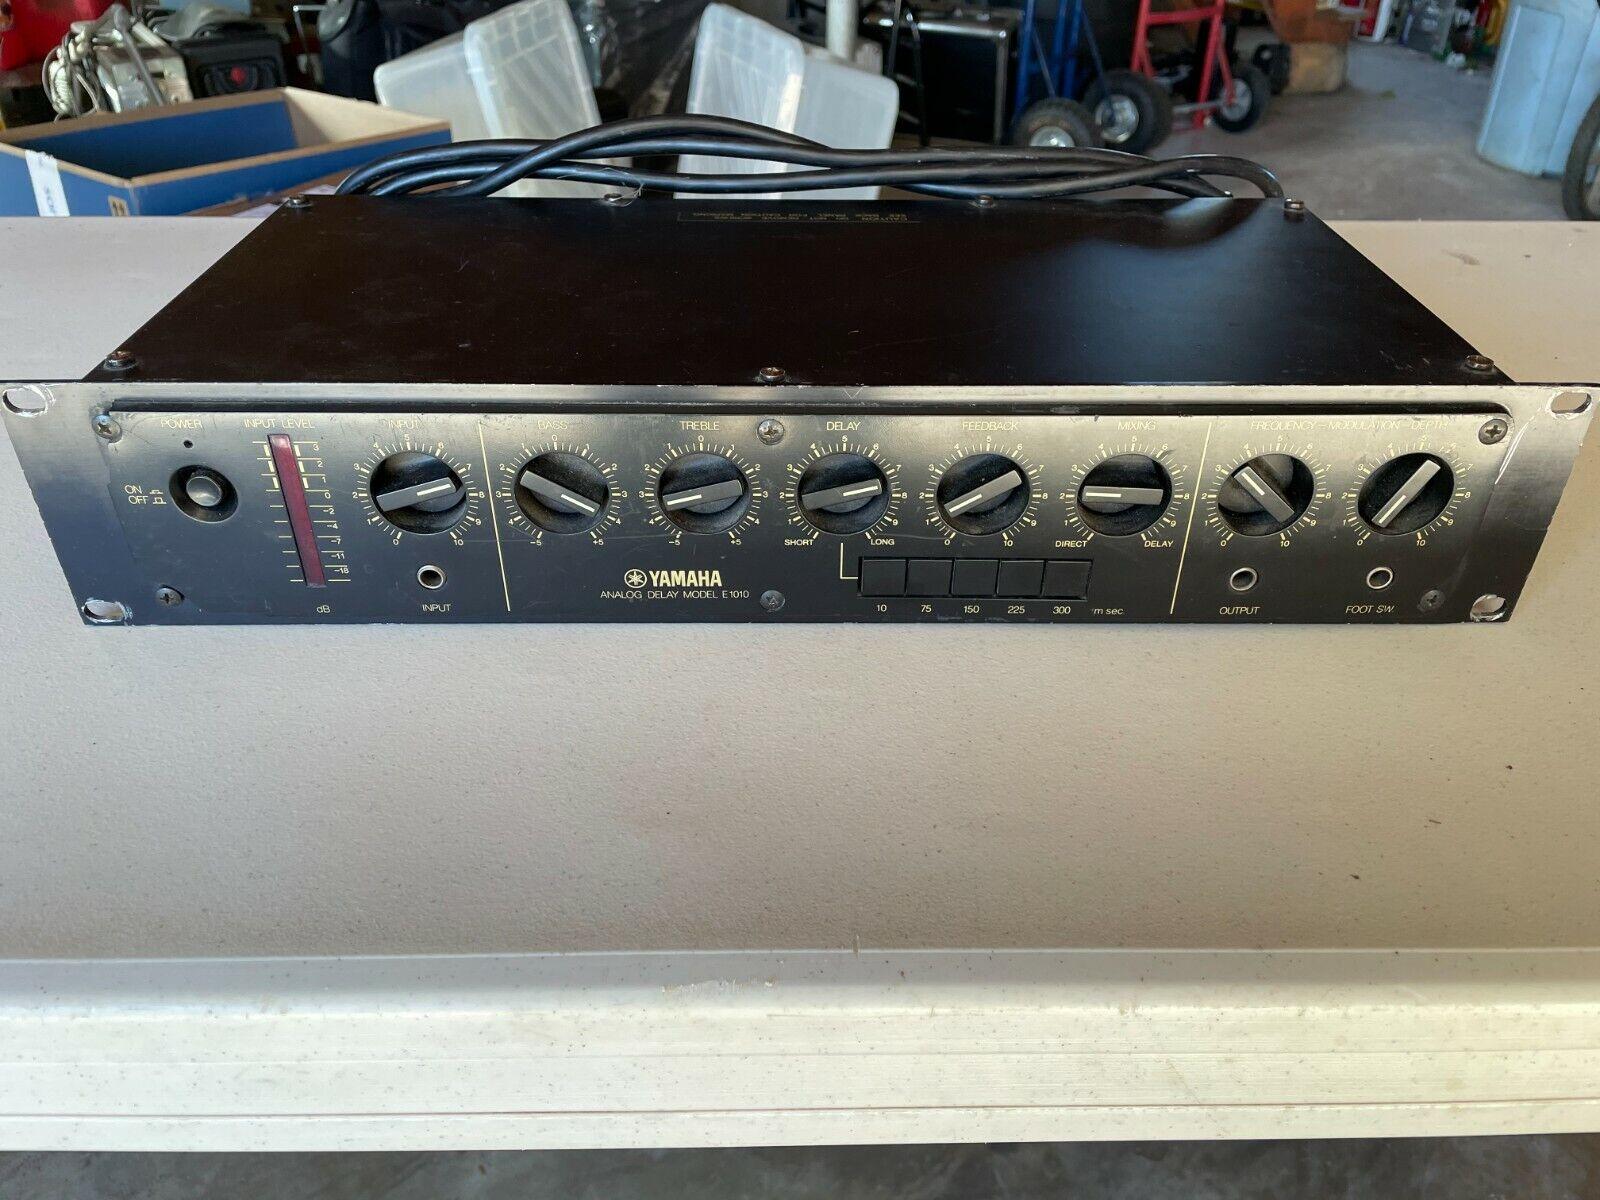 Yamaha E1010 analog delay. Buy it now for 400.00